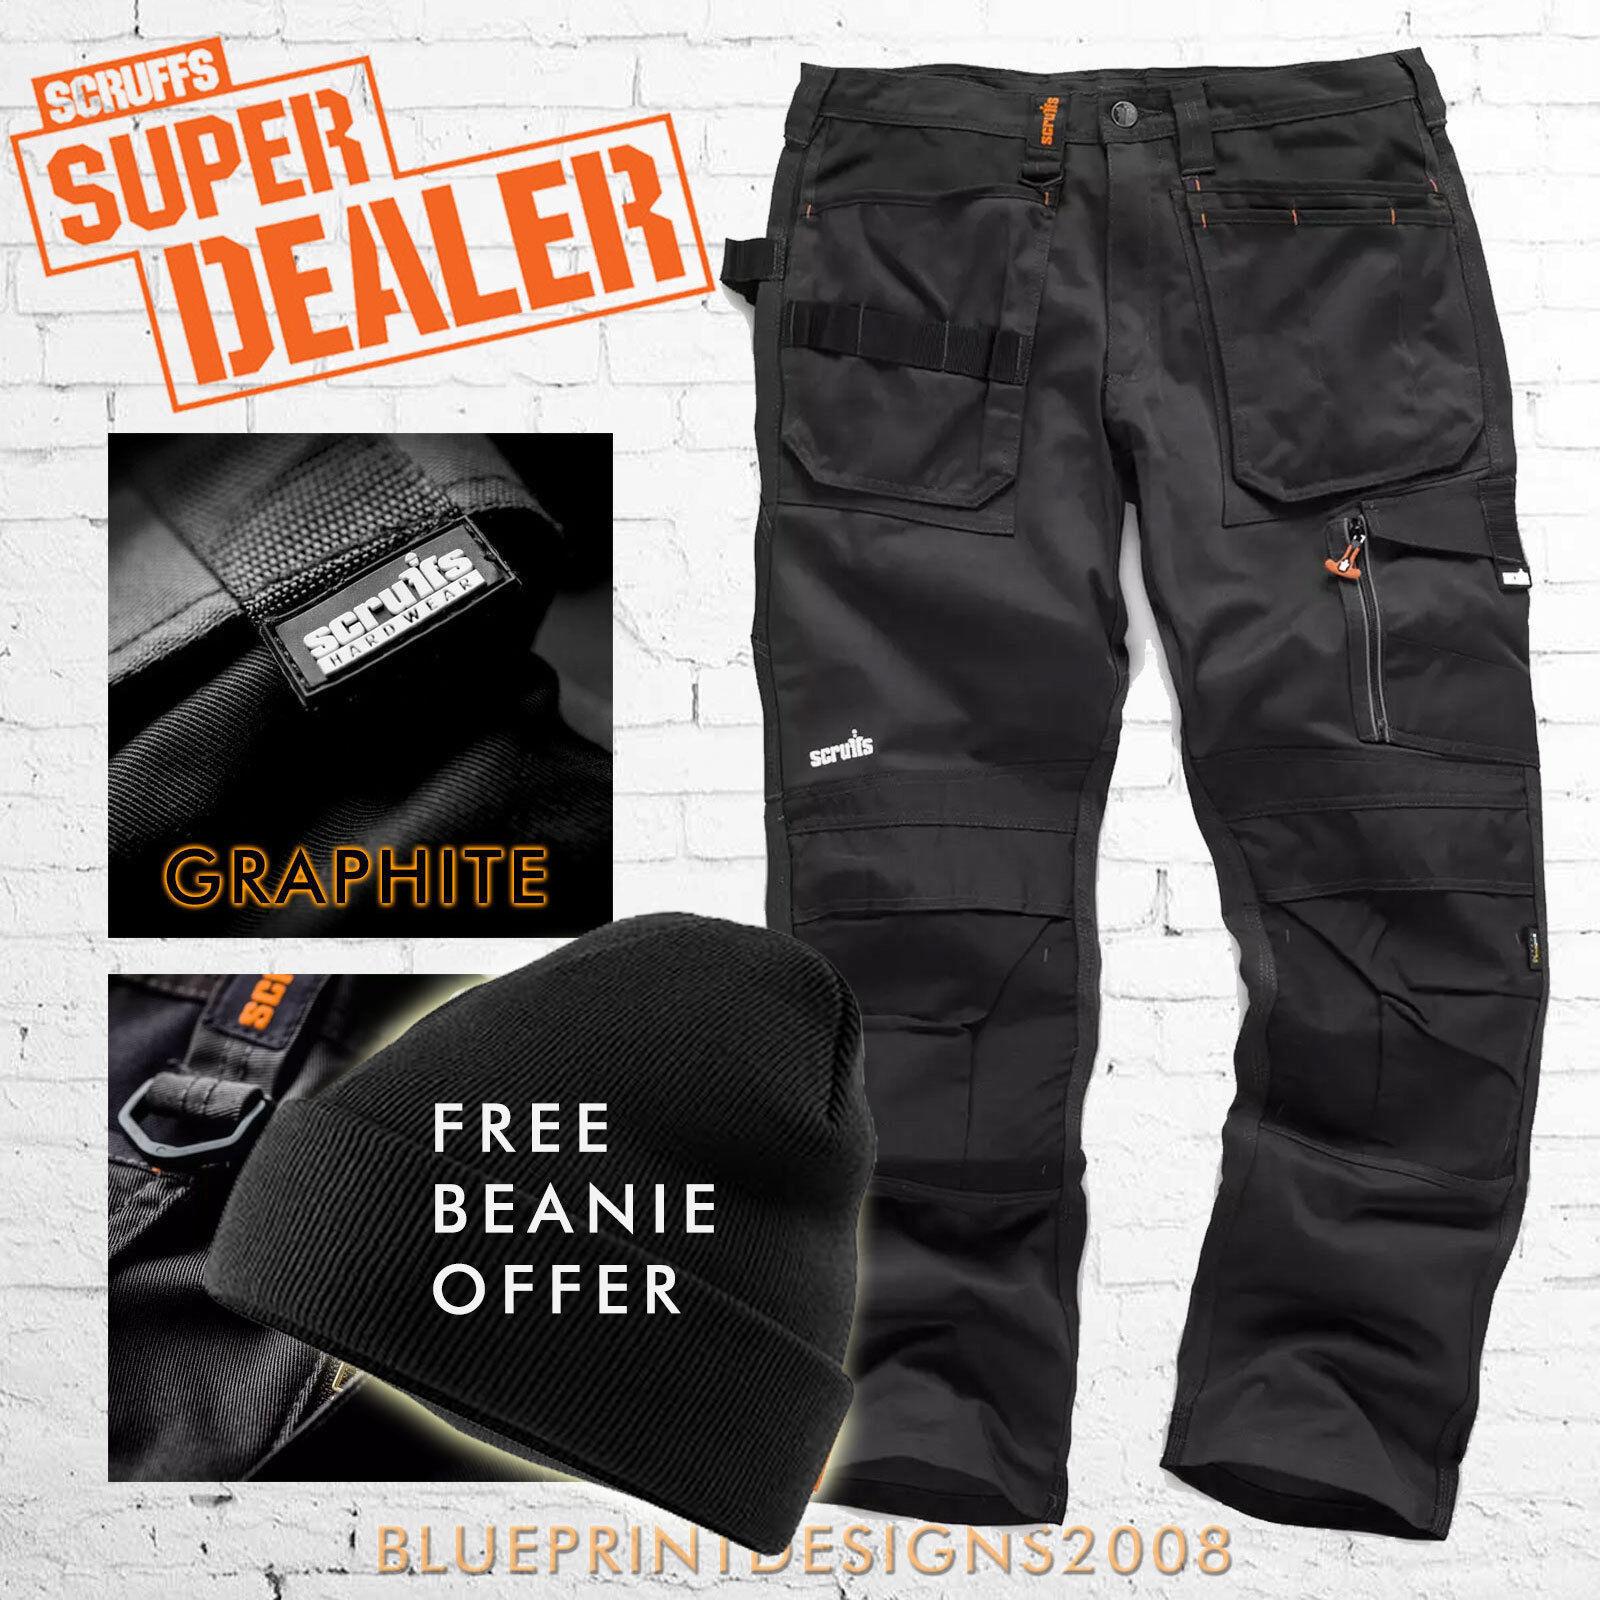 Scruffs 3D TRADE GRAPHITE CORDURA Cargo Combat Trousers plus FREE BEANIE